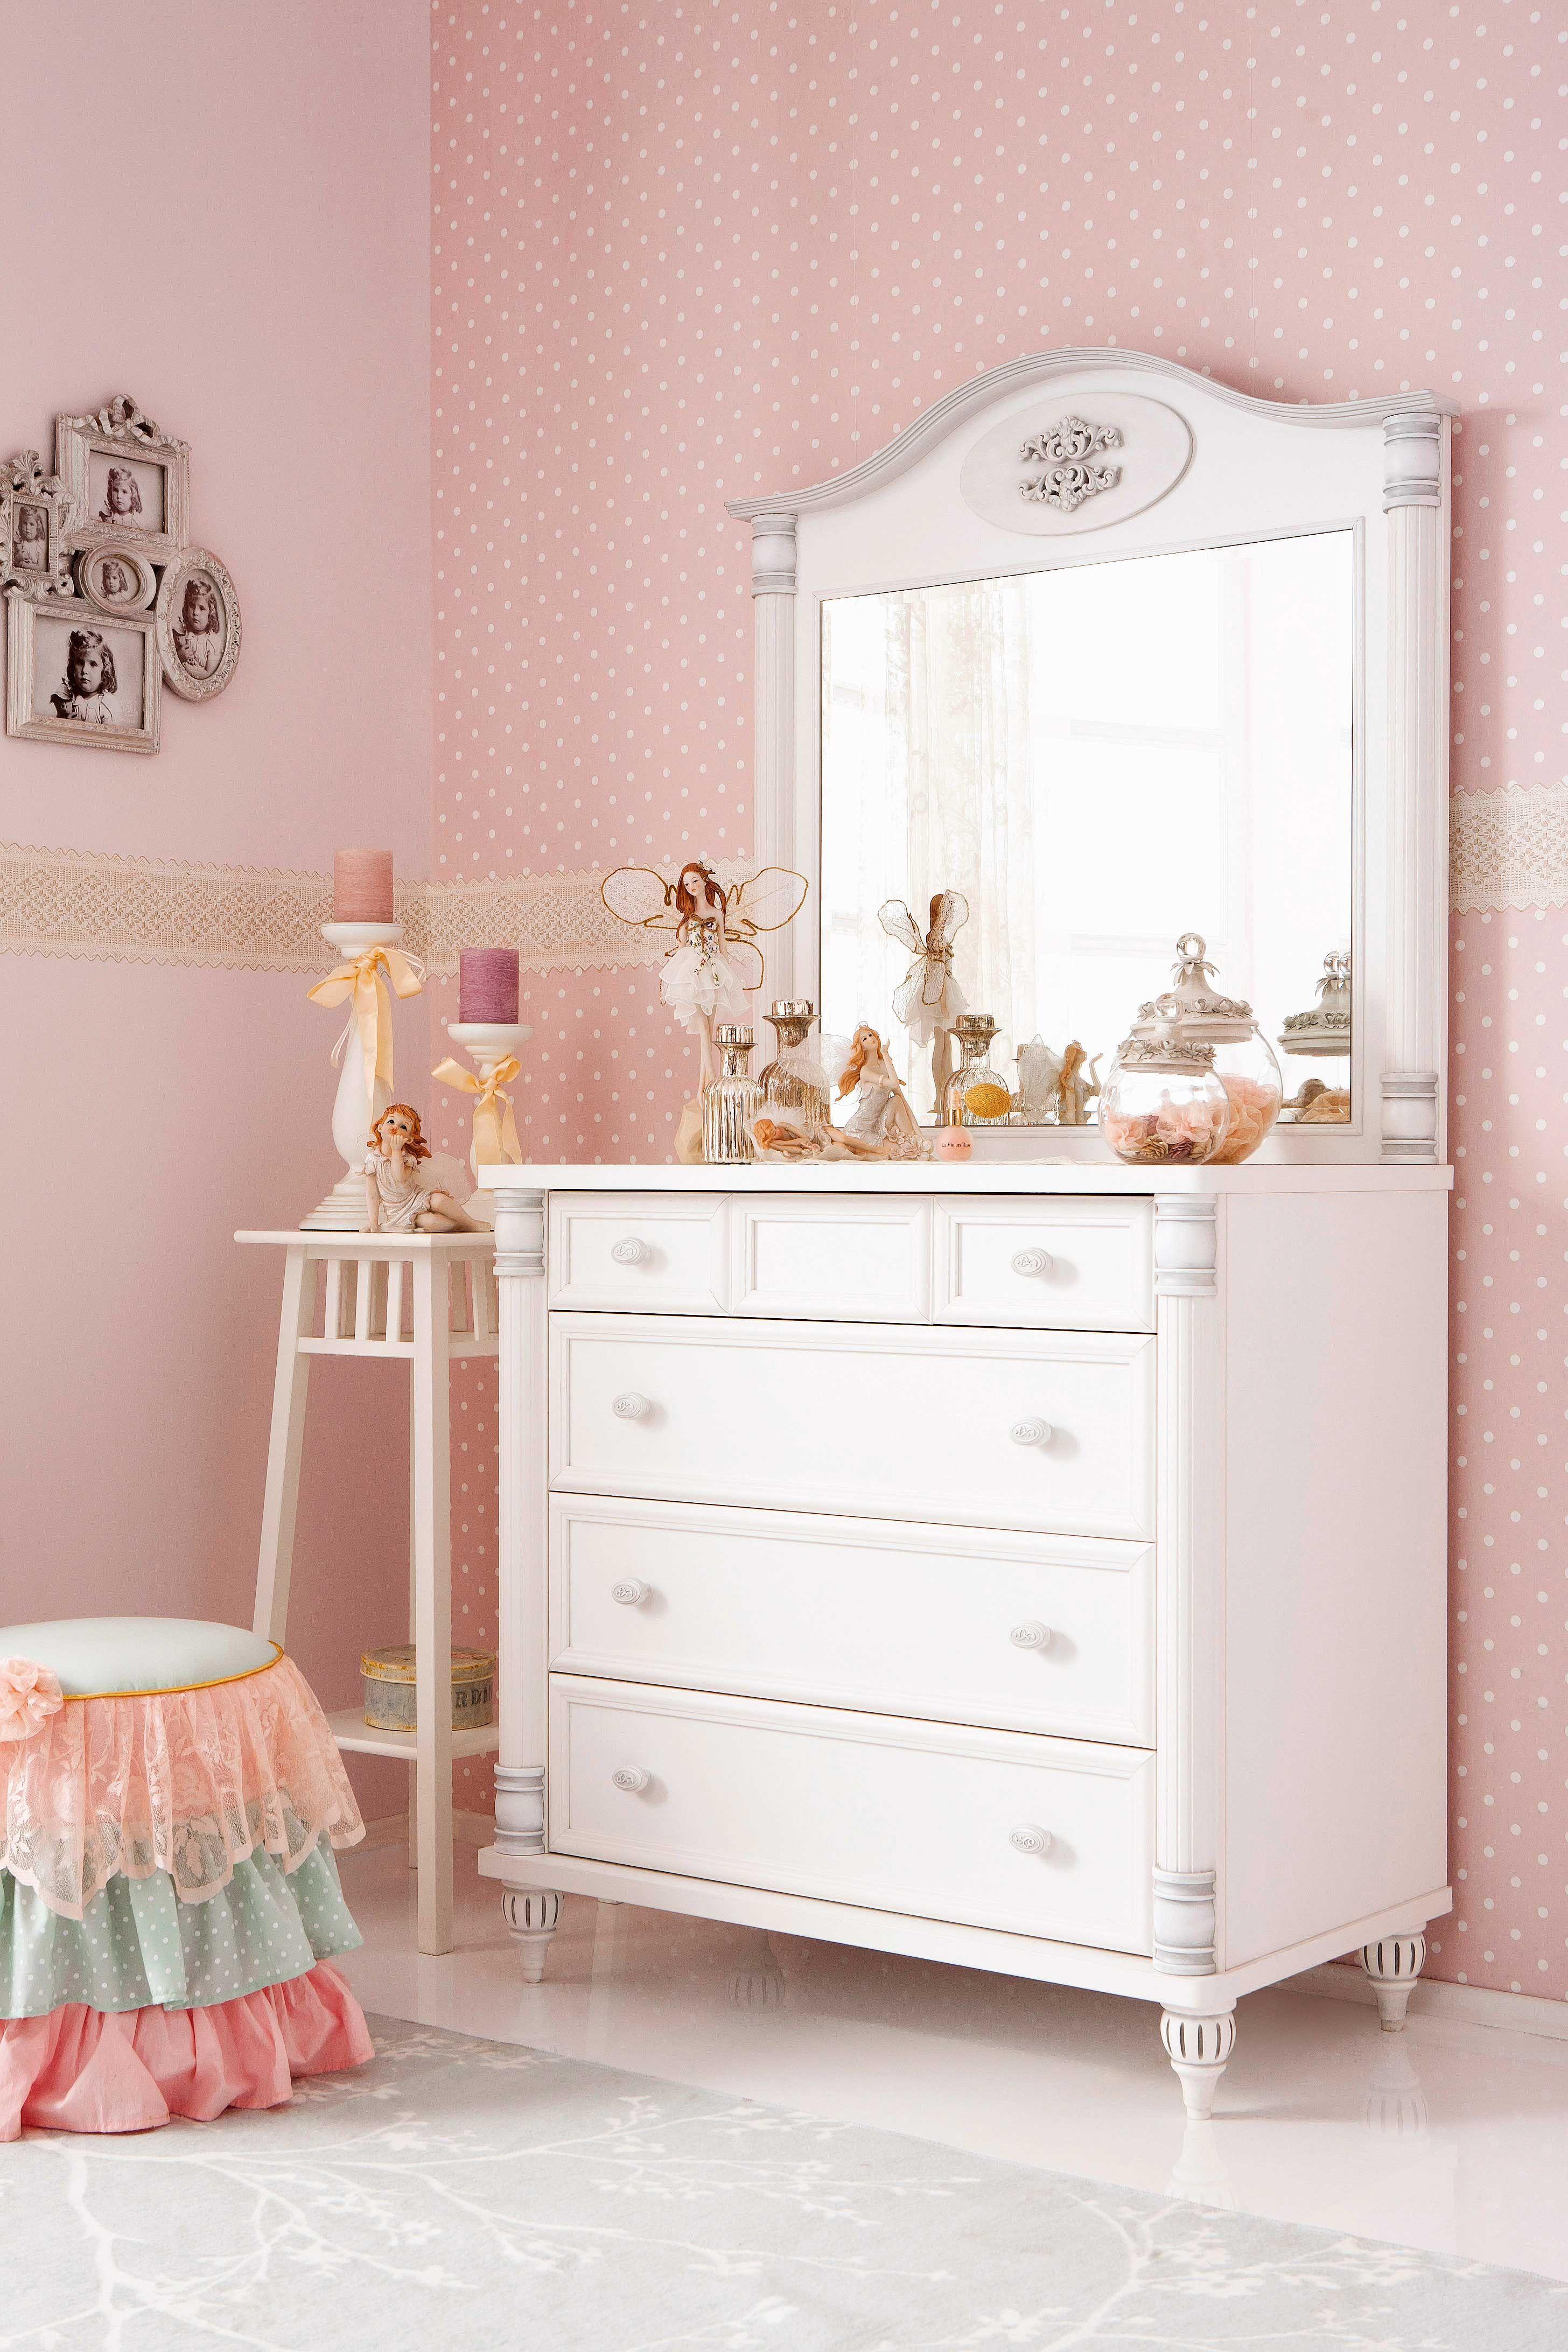 Cilek romantic schminkkommode sideboard mit aufsatzspiegel cilek kinderzimmer romantic - Kinderzimmer sideboard ...